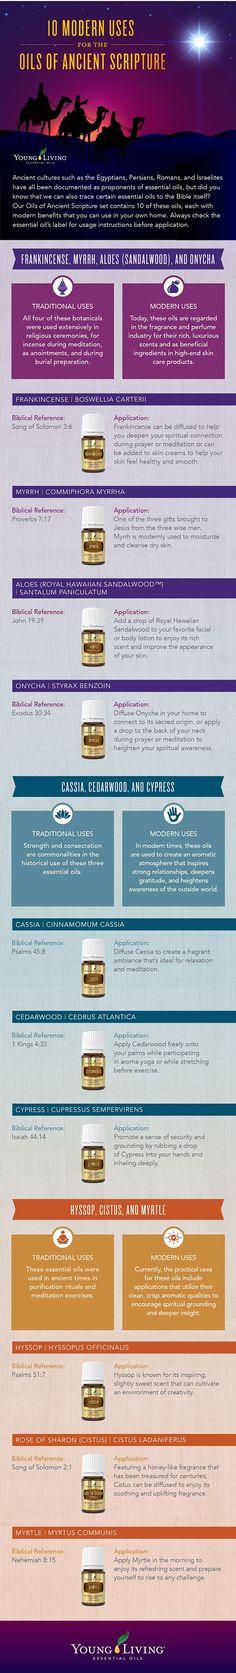 Biblical Oils Infographic